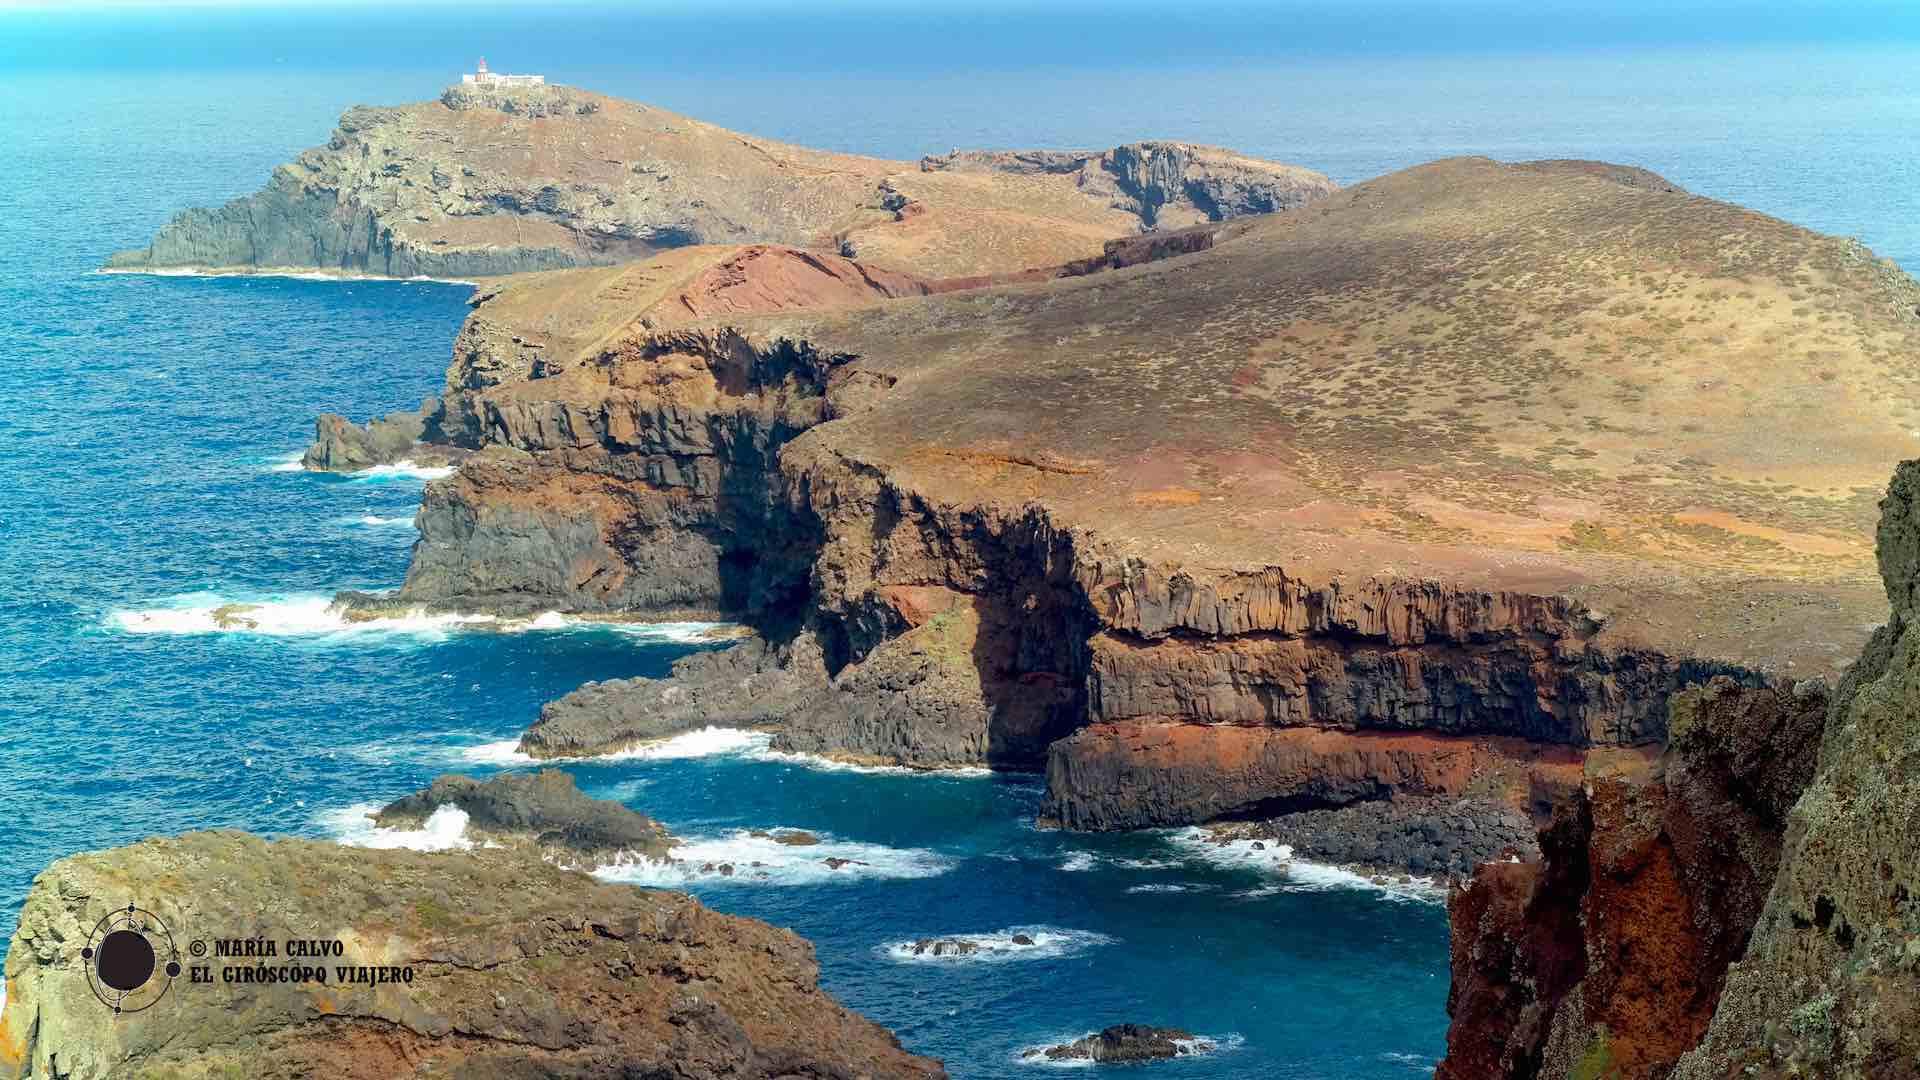 La Península de São Lourenço, ¡es como estar en otro mundo!